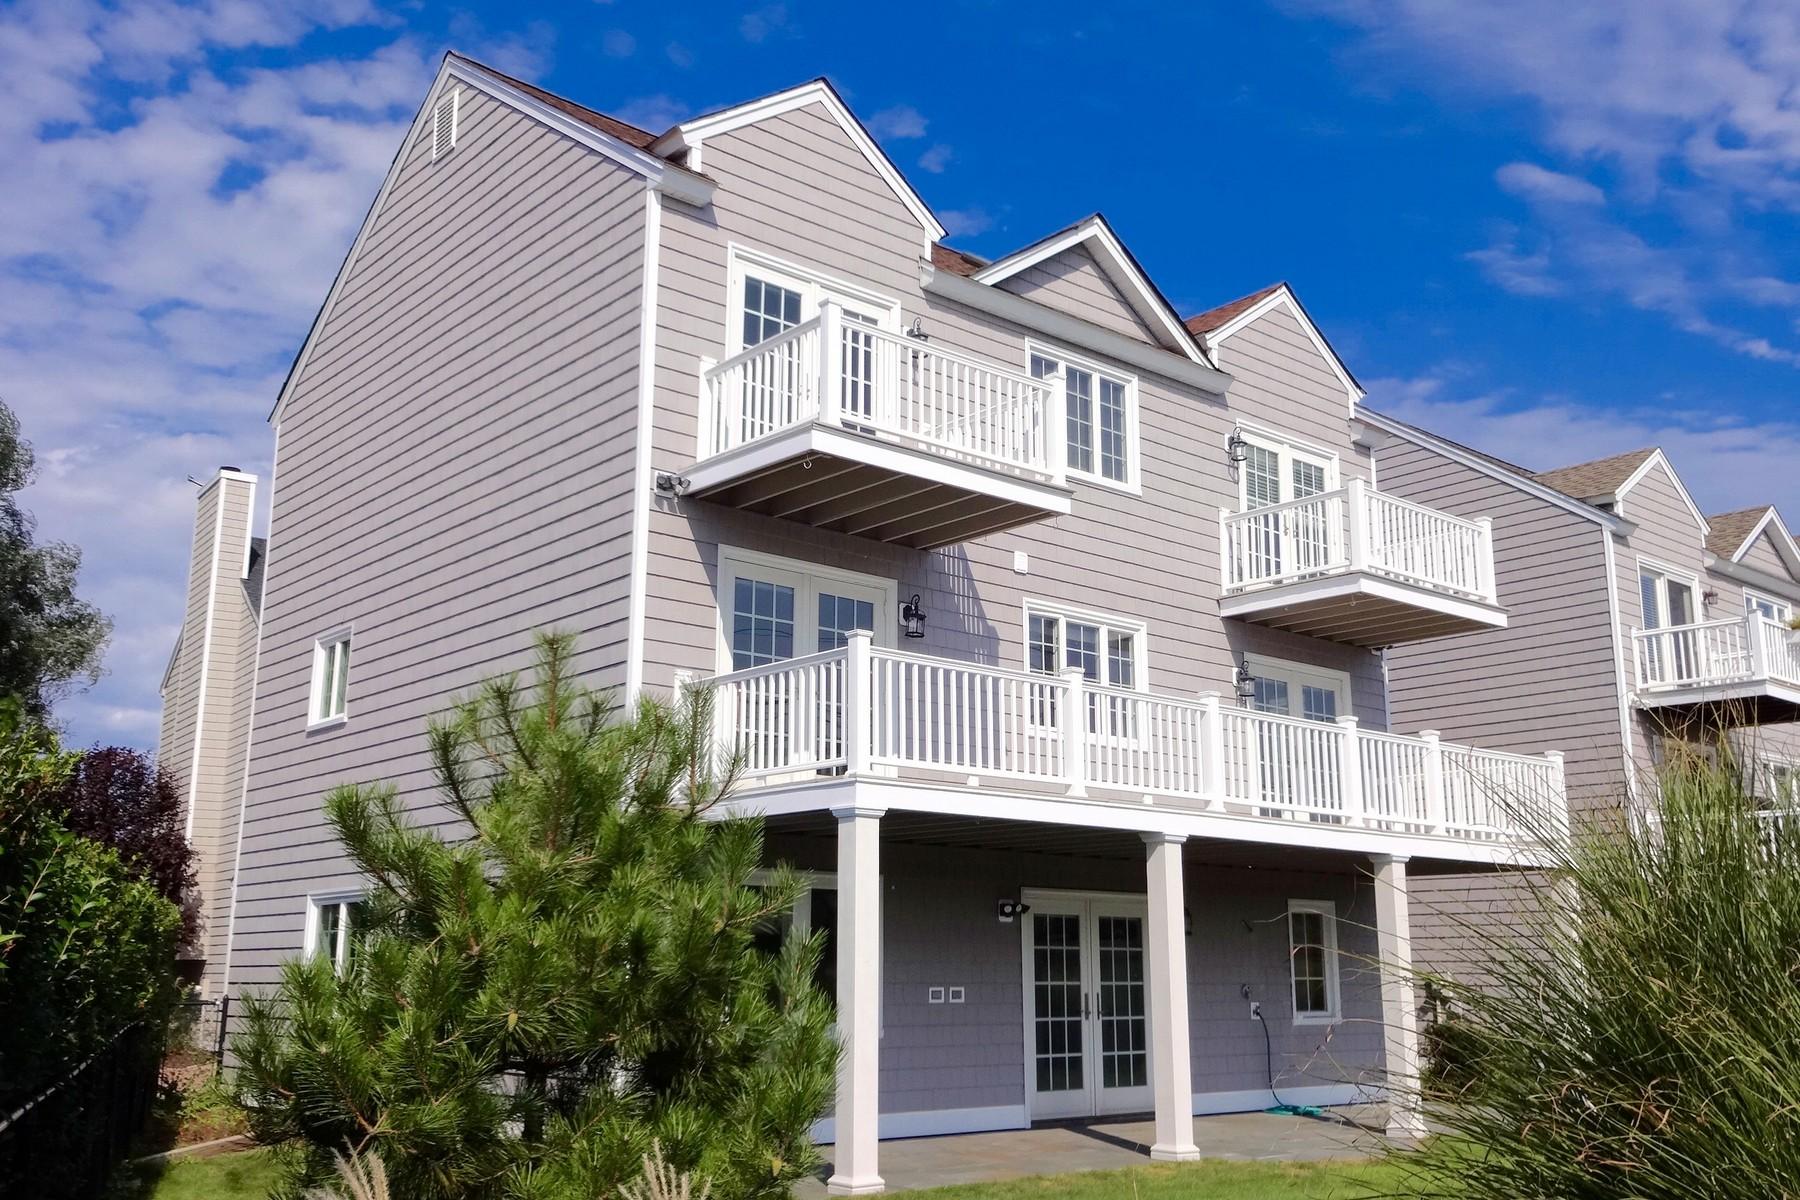 for Sale at Fairfield Beach Townhouse 672 Fairfield Beach Road 672 Fairfield, Connecticut, 06824 United States